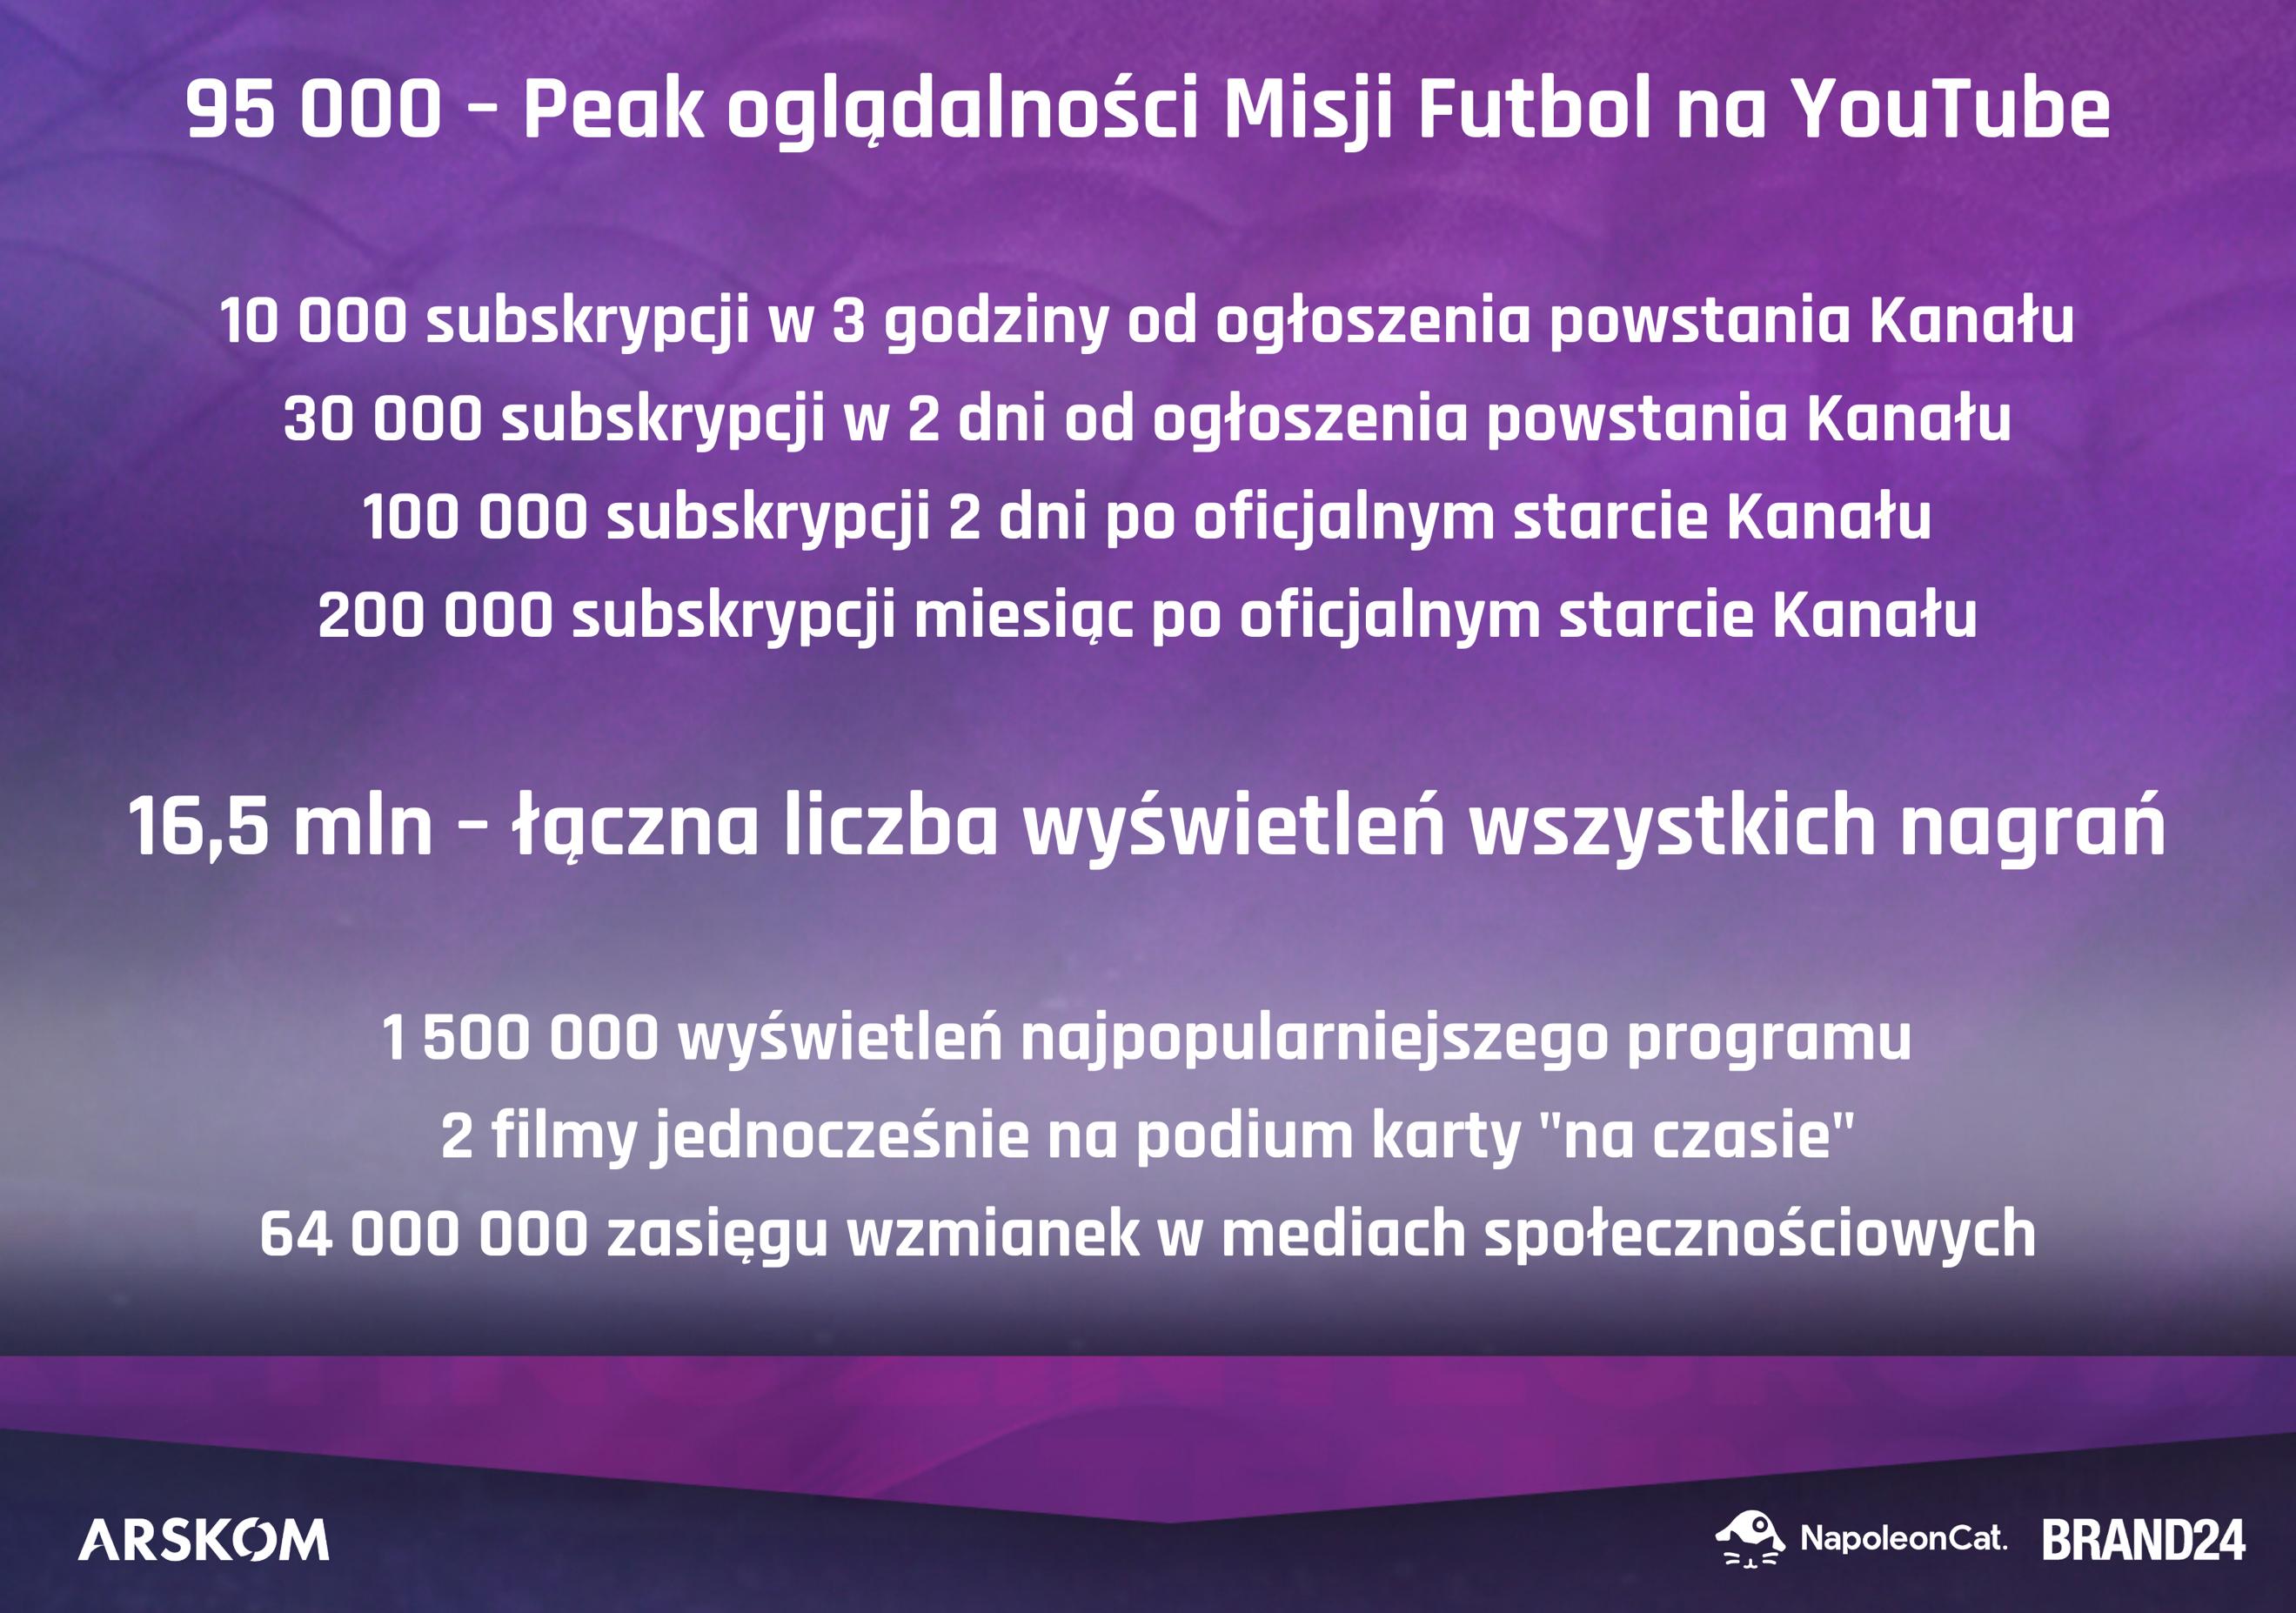 Misja Futbol YouTube statystyki